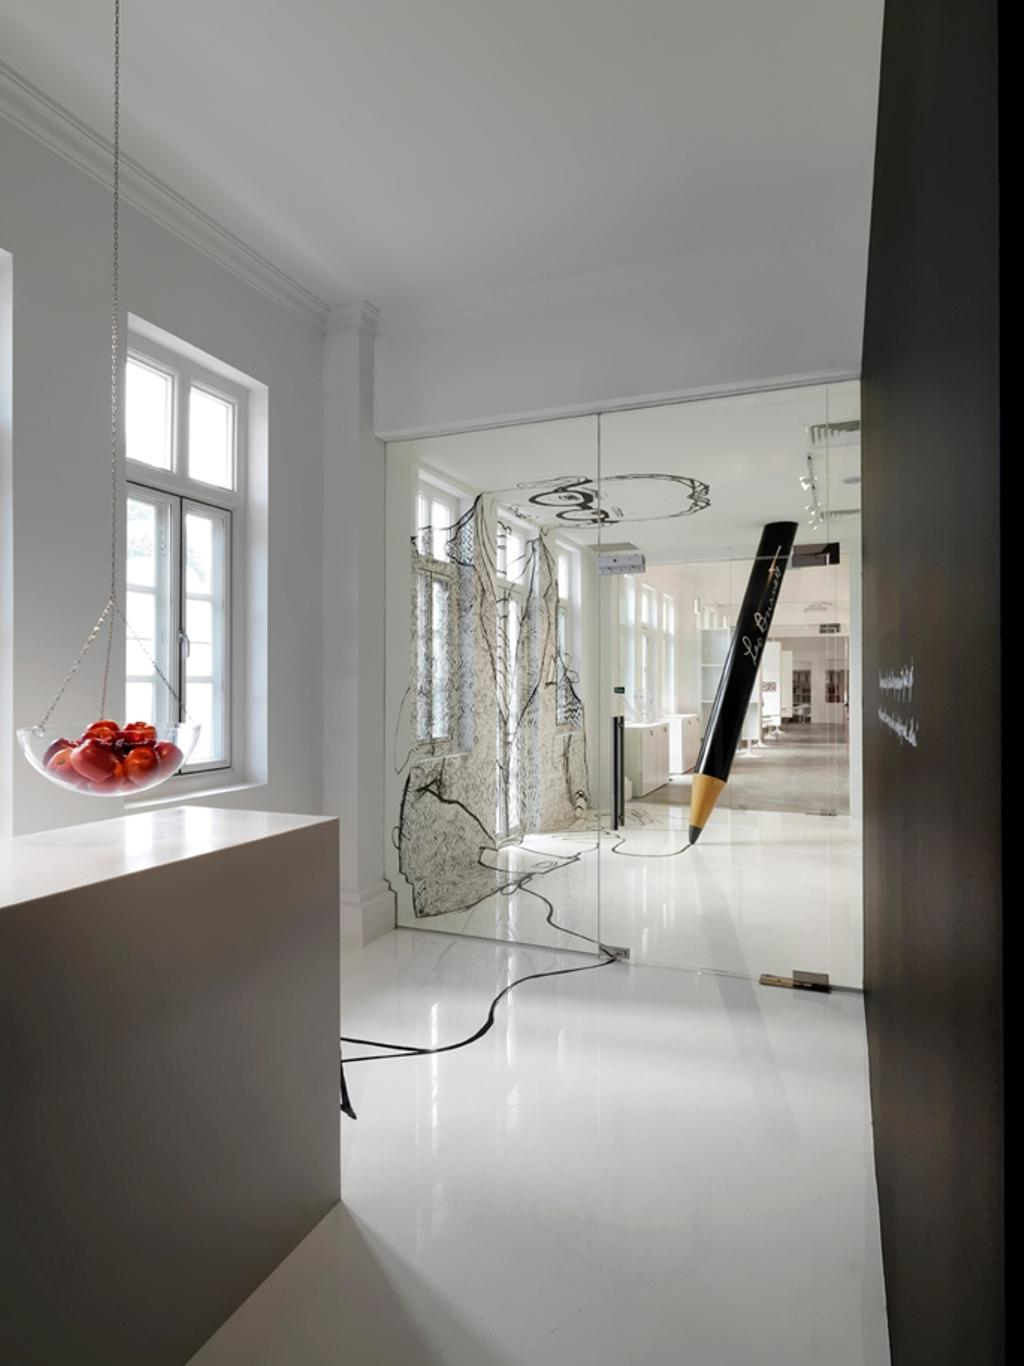 Leo Burnett, Commercial, Architect, Ministry of Design, Eclectic, White Flooring, White Ceiling, White Wall, White Windows, Counter, Hanging Fruit Basket, Glass Doors, Wallart, Pencil Pillar